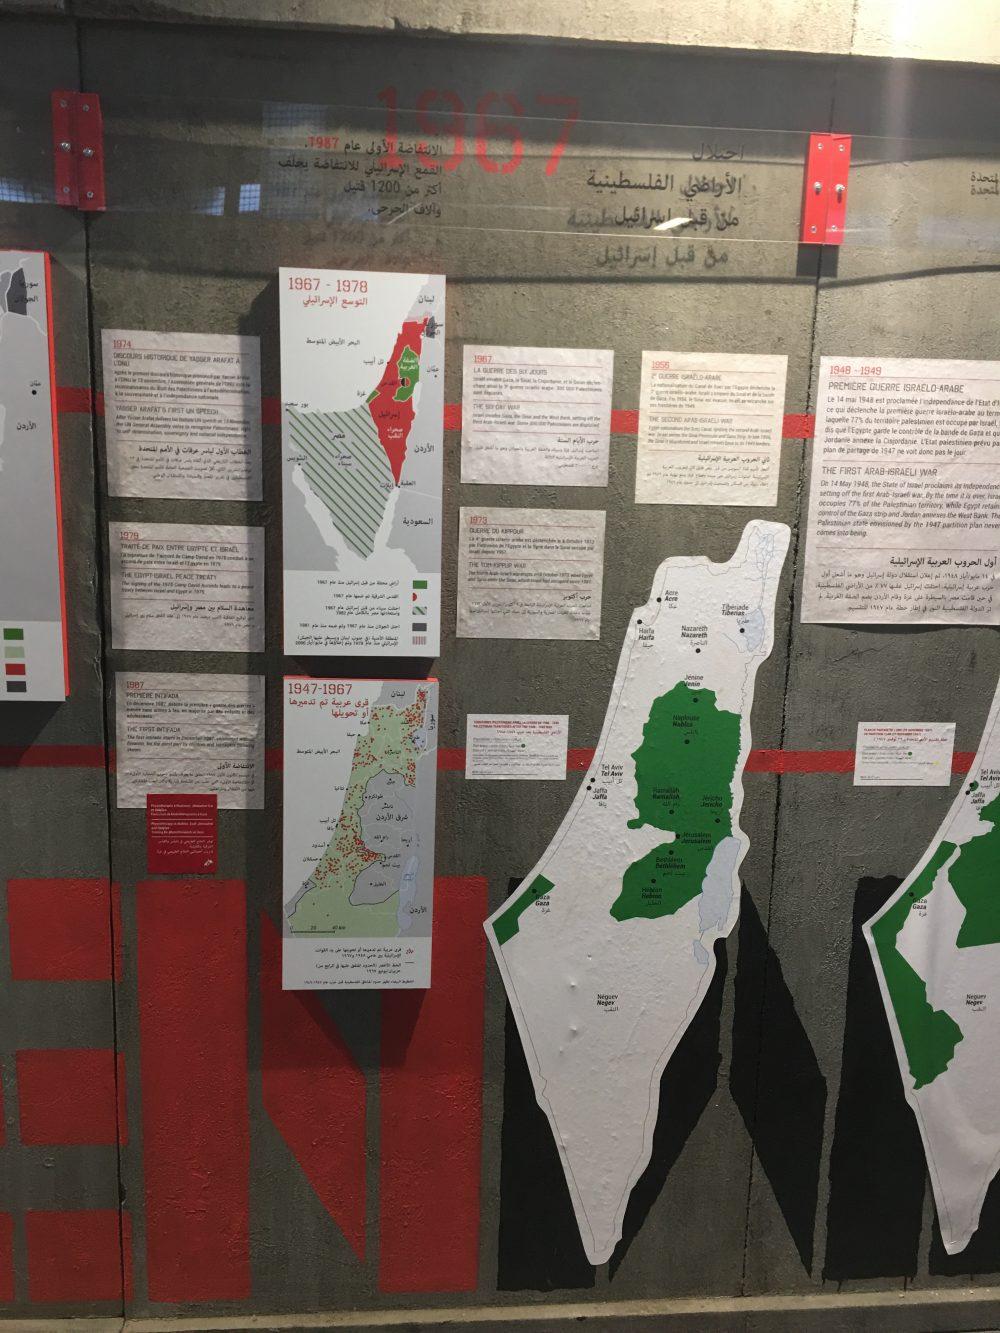 The Israeli occupation of Palestine